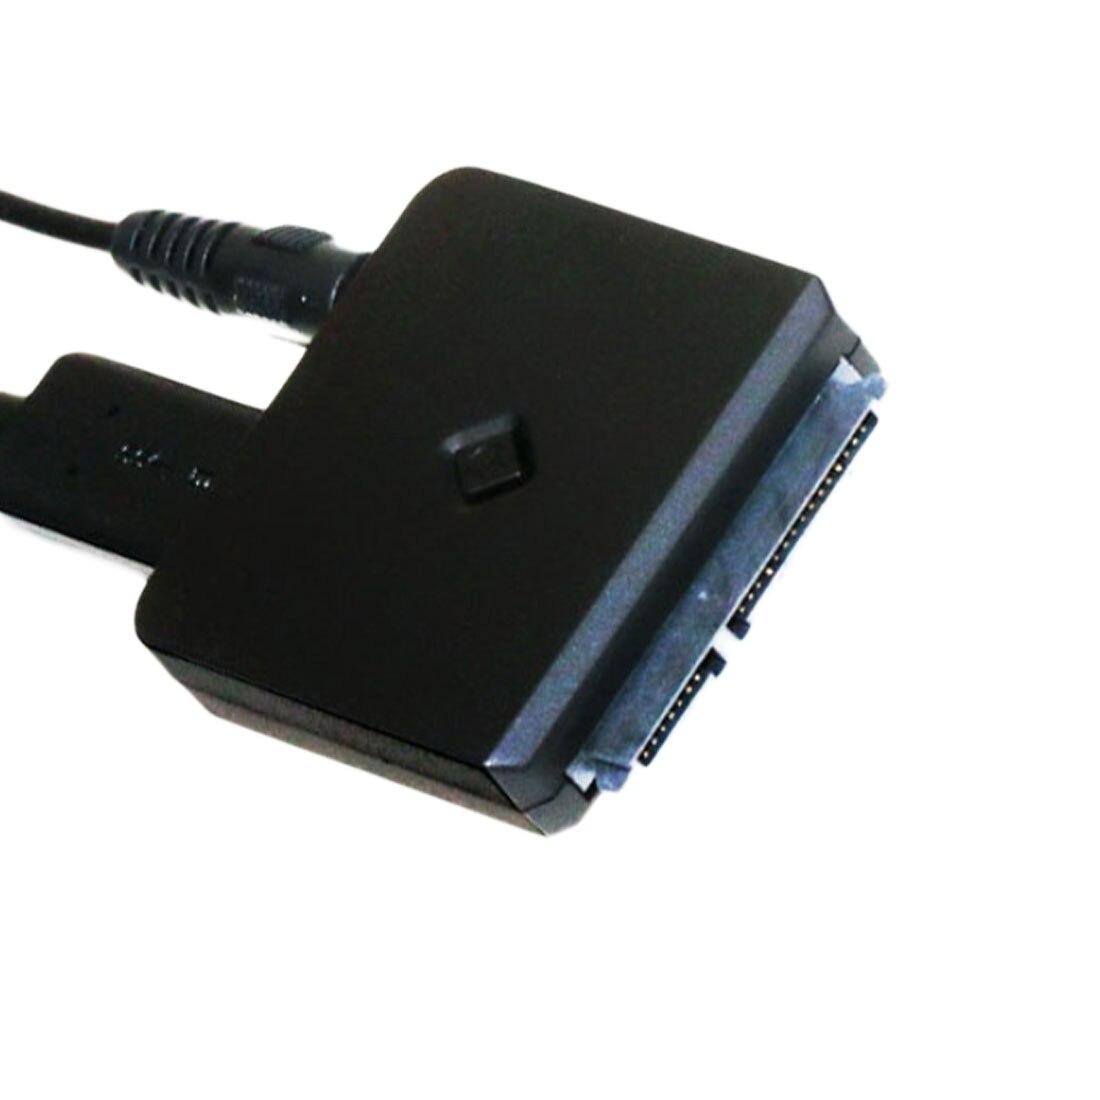 Etmakit 2.5/3.5 Polegada Sata para USB 3.0 Driver de Disco Rígido SSD USB para Sata HDD Converter com Adaptador De Energia para IOS Win7 Win8 Win10